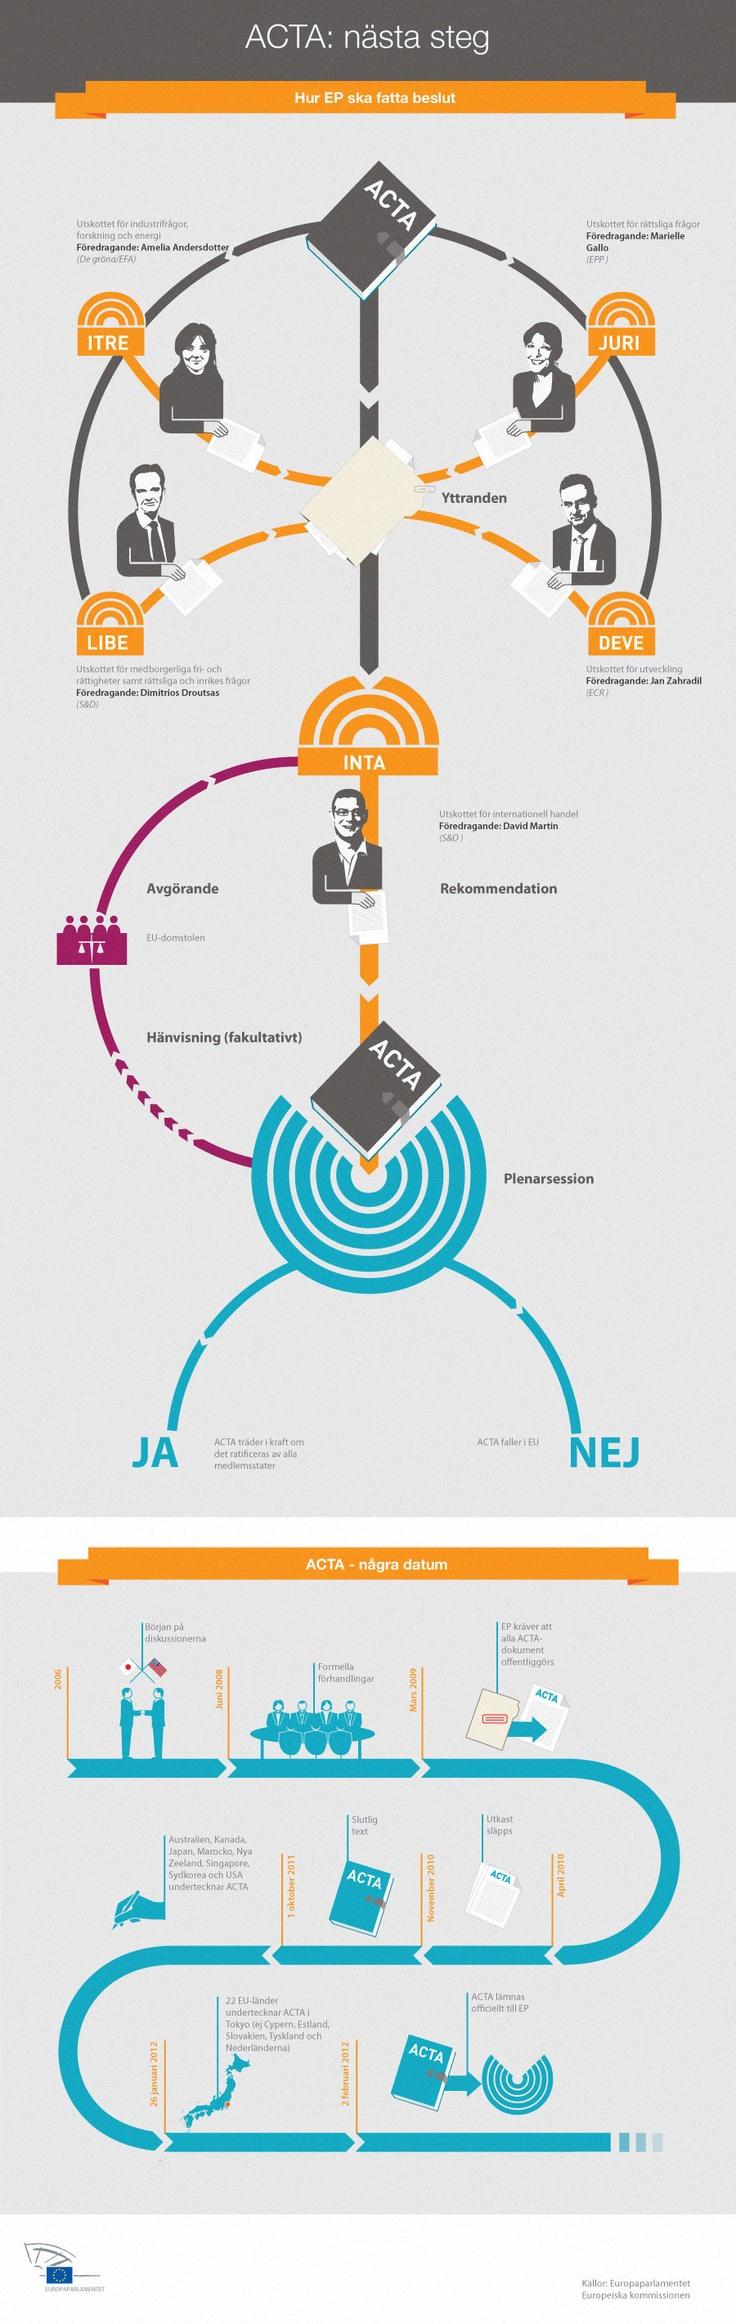 ACTA: Beslutsgången i Europaparlamentet